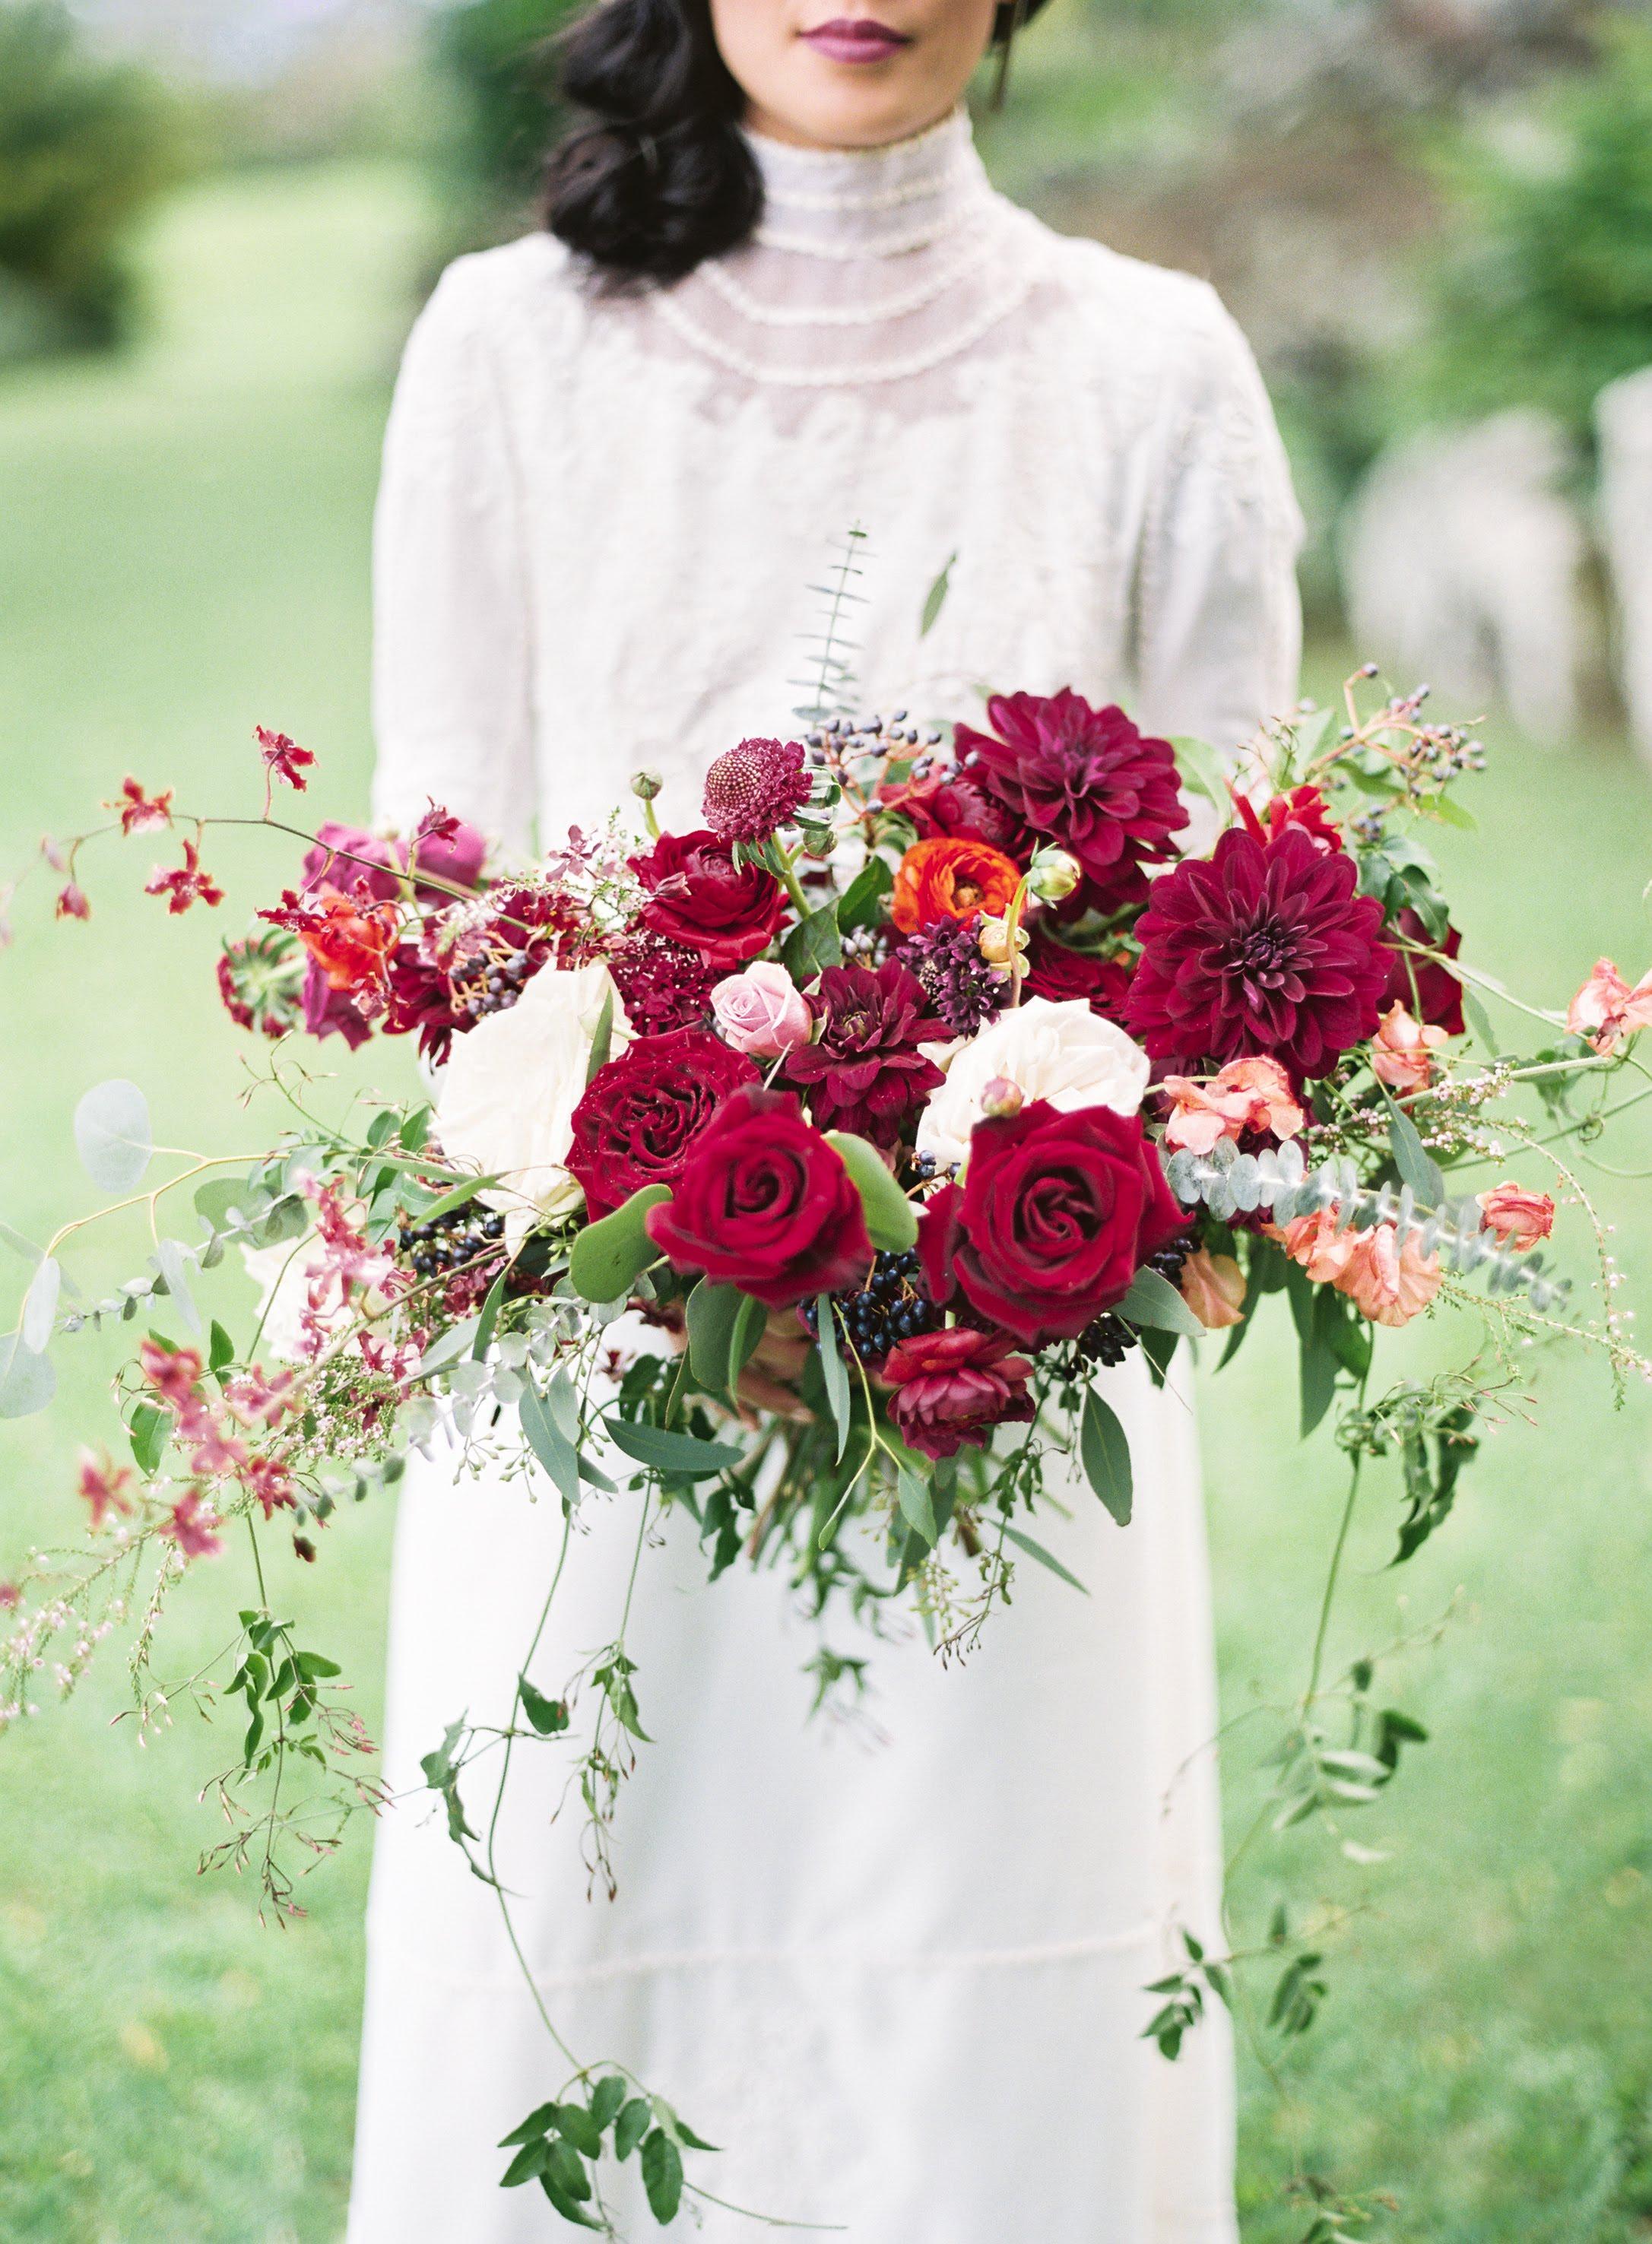 Up close of bride holding floral arrangement